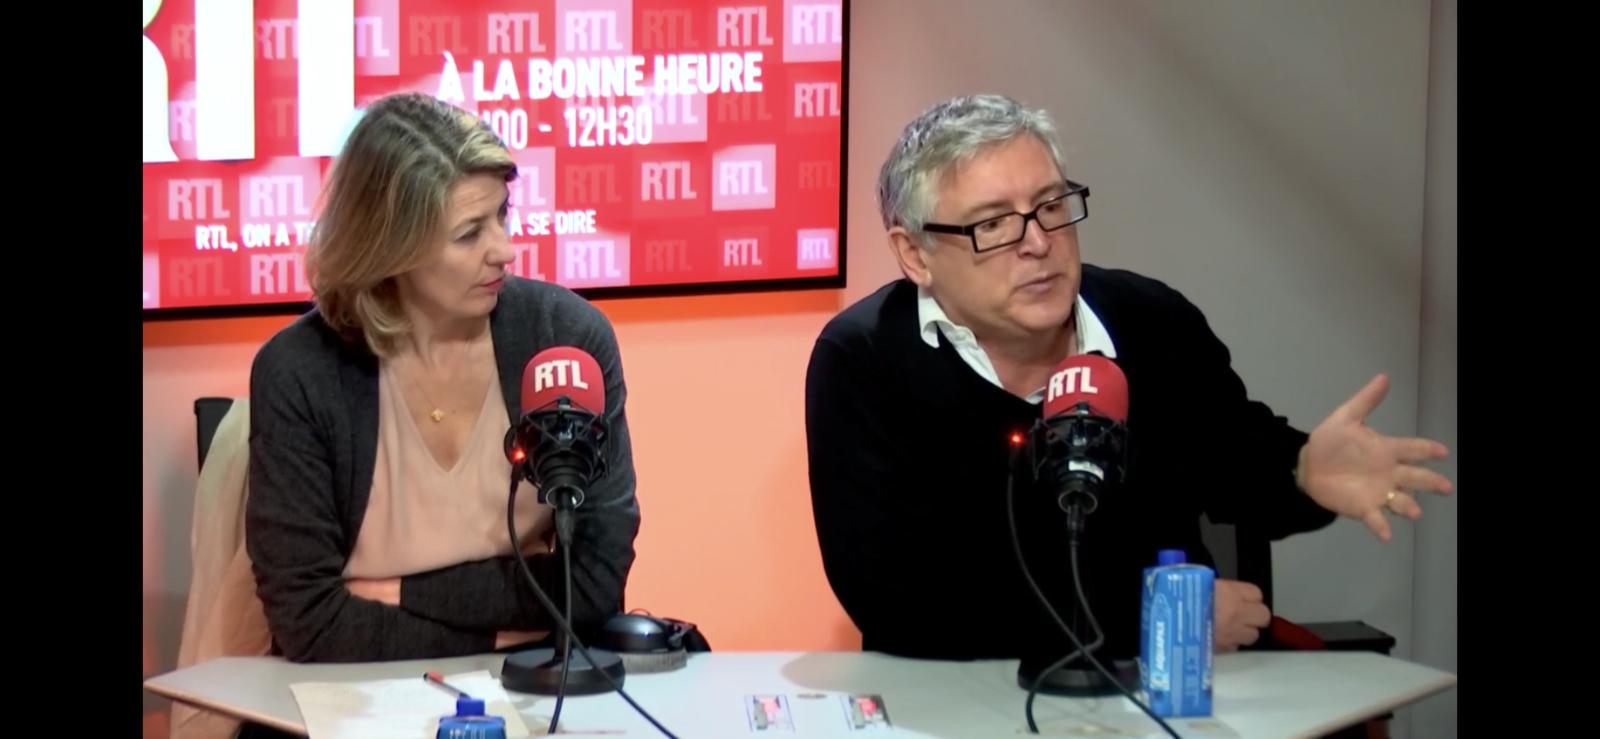 Michel Onfray - A la bonne heure (RTL) - 26.11.2019